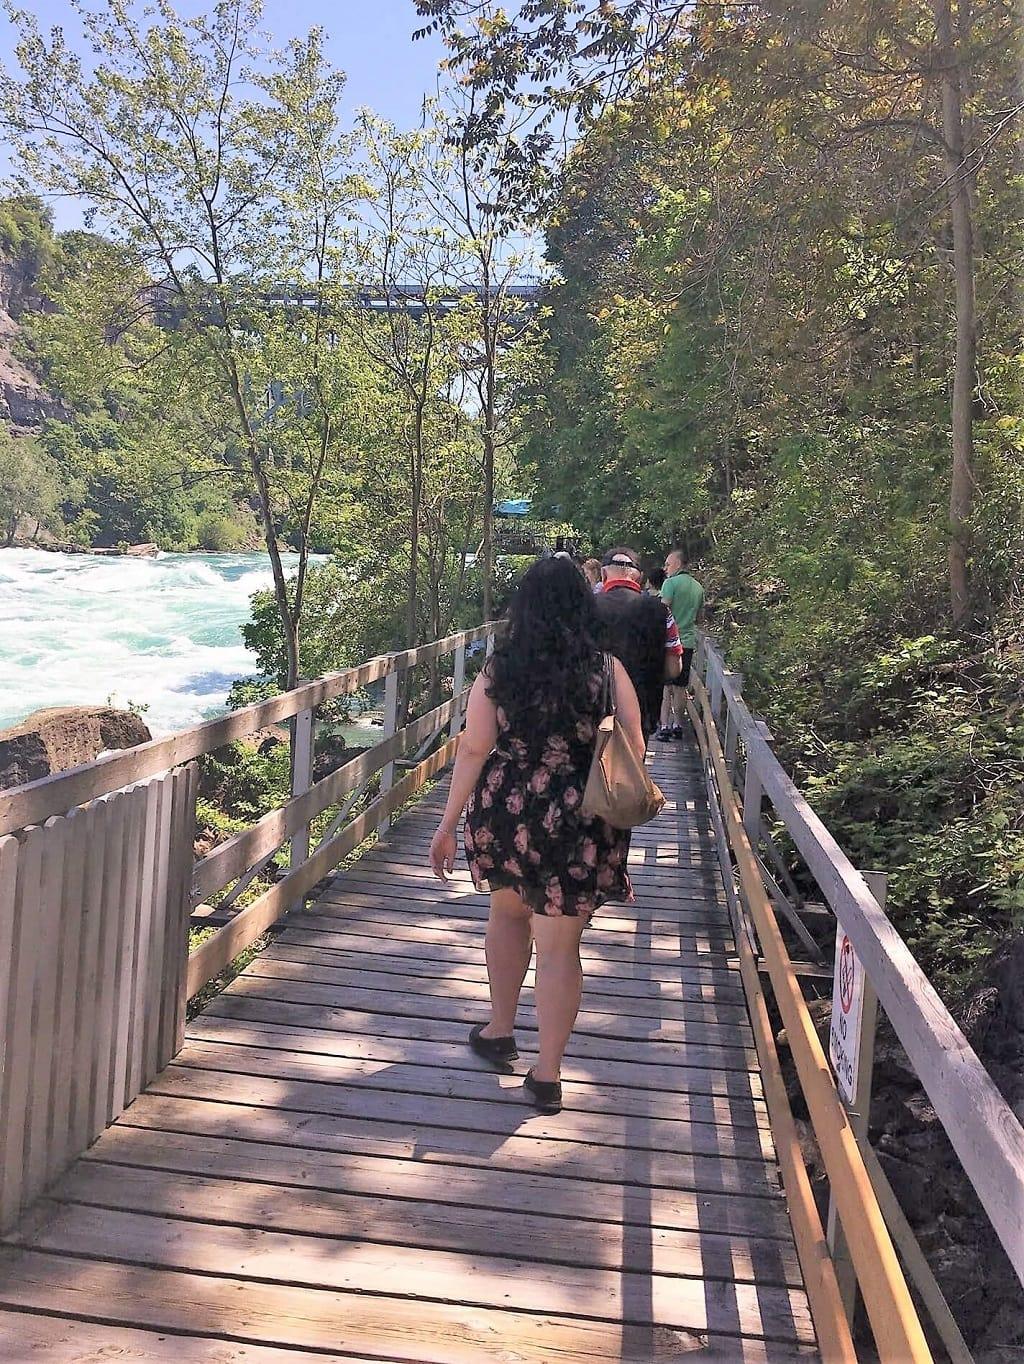 Anisa enjoying the White Water walk on a wooden bridge along the Niagara River.